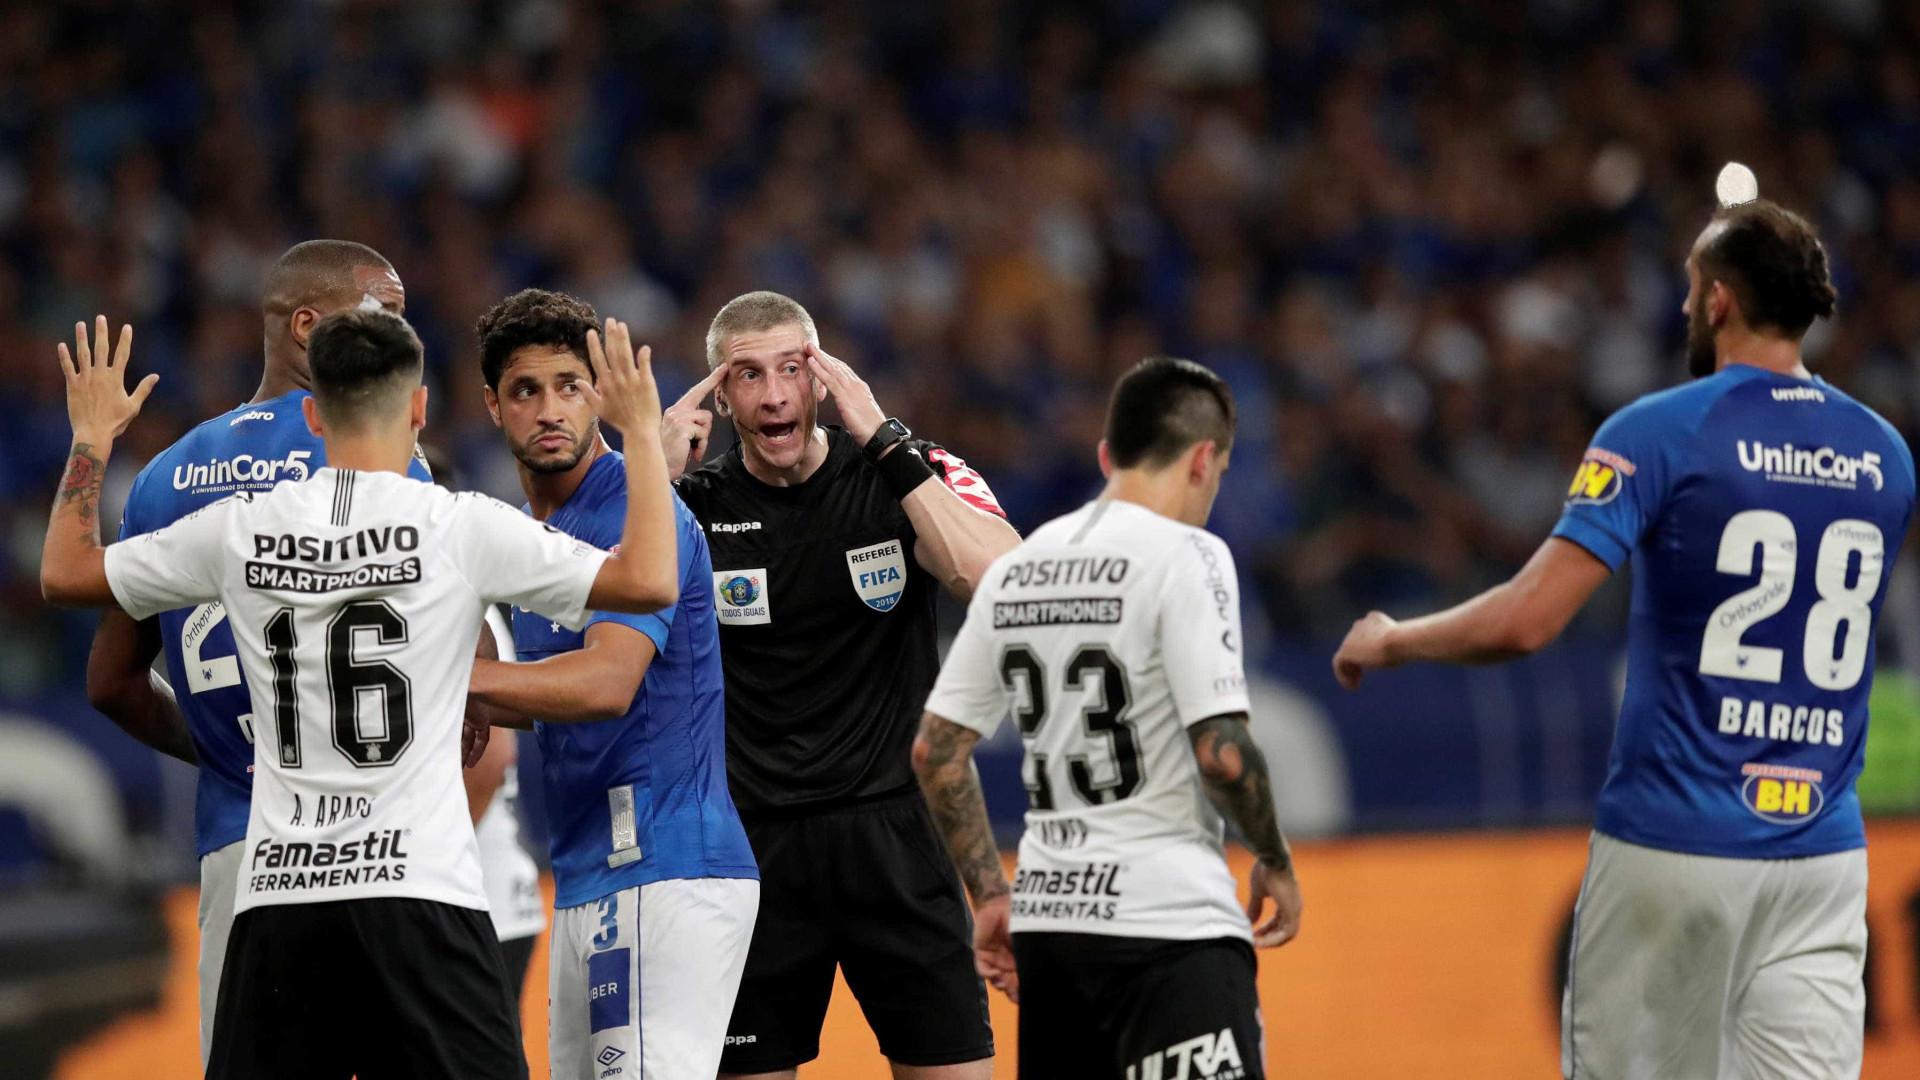 Corinthians aposta em descanso e apoio da torcida para virada